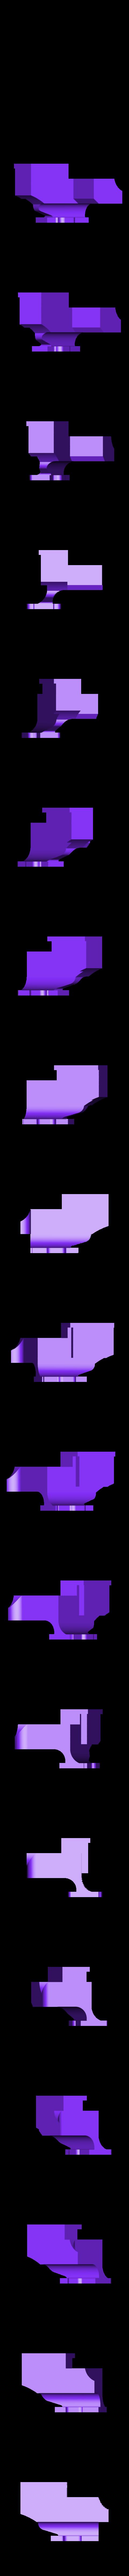 Front_Engine_-_Part_6-arm_3.STL Download free STL file 4-8-8-4 Big Boy Locomotive • 3D printer object, RaymondDeLuca